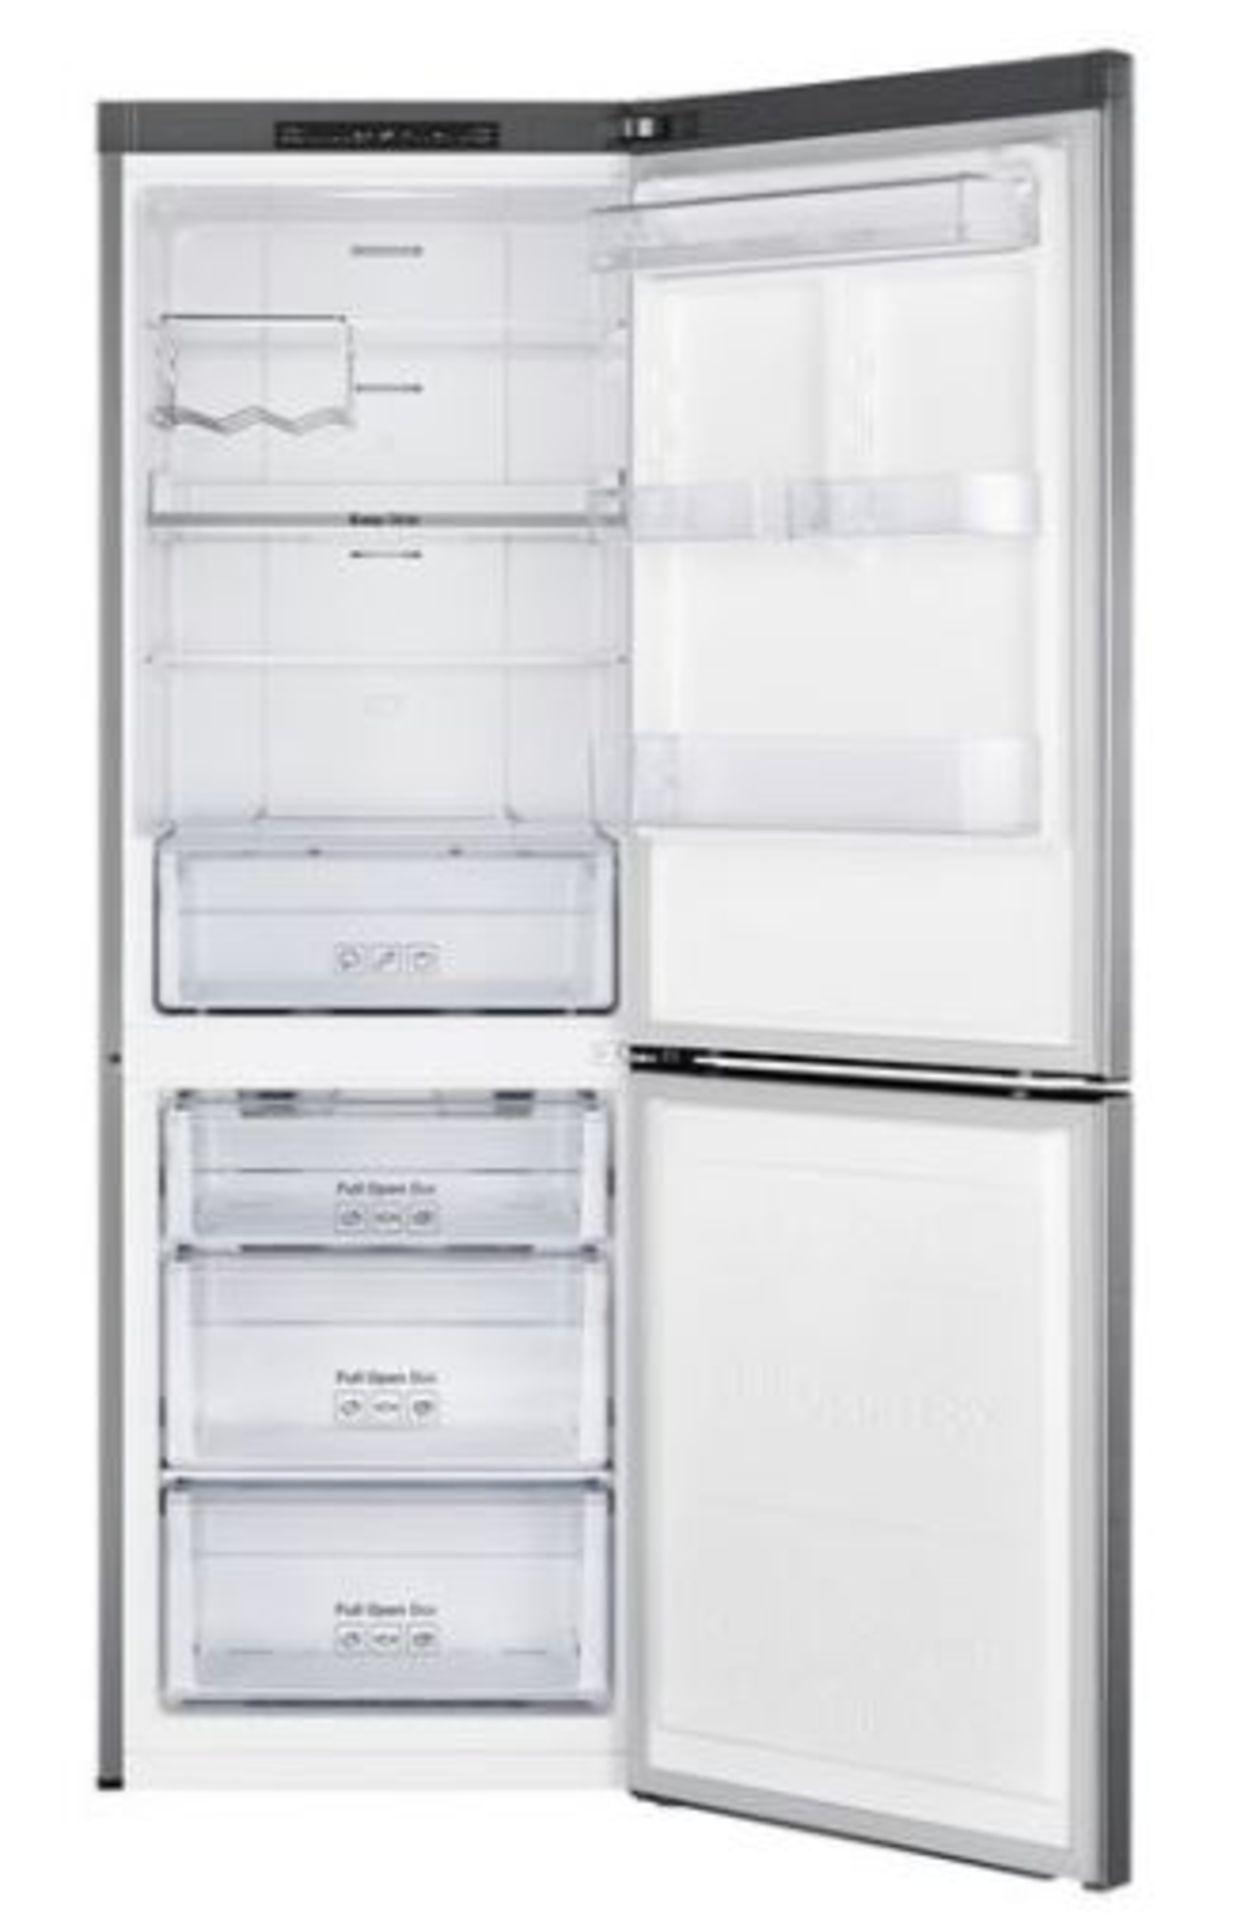 Pallet of 1 Samsung 60CM Fridge Freezer. Latest selling price £399 - Image 2 of 7